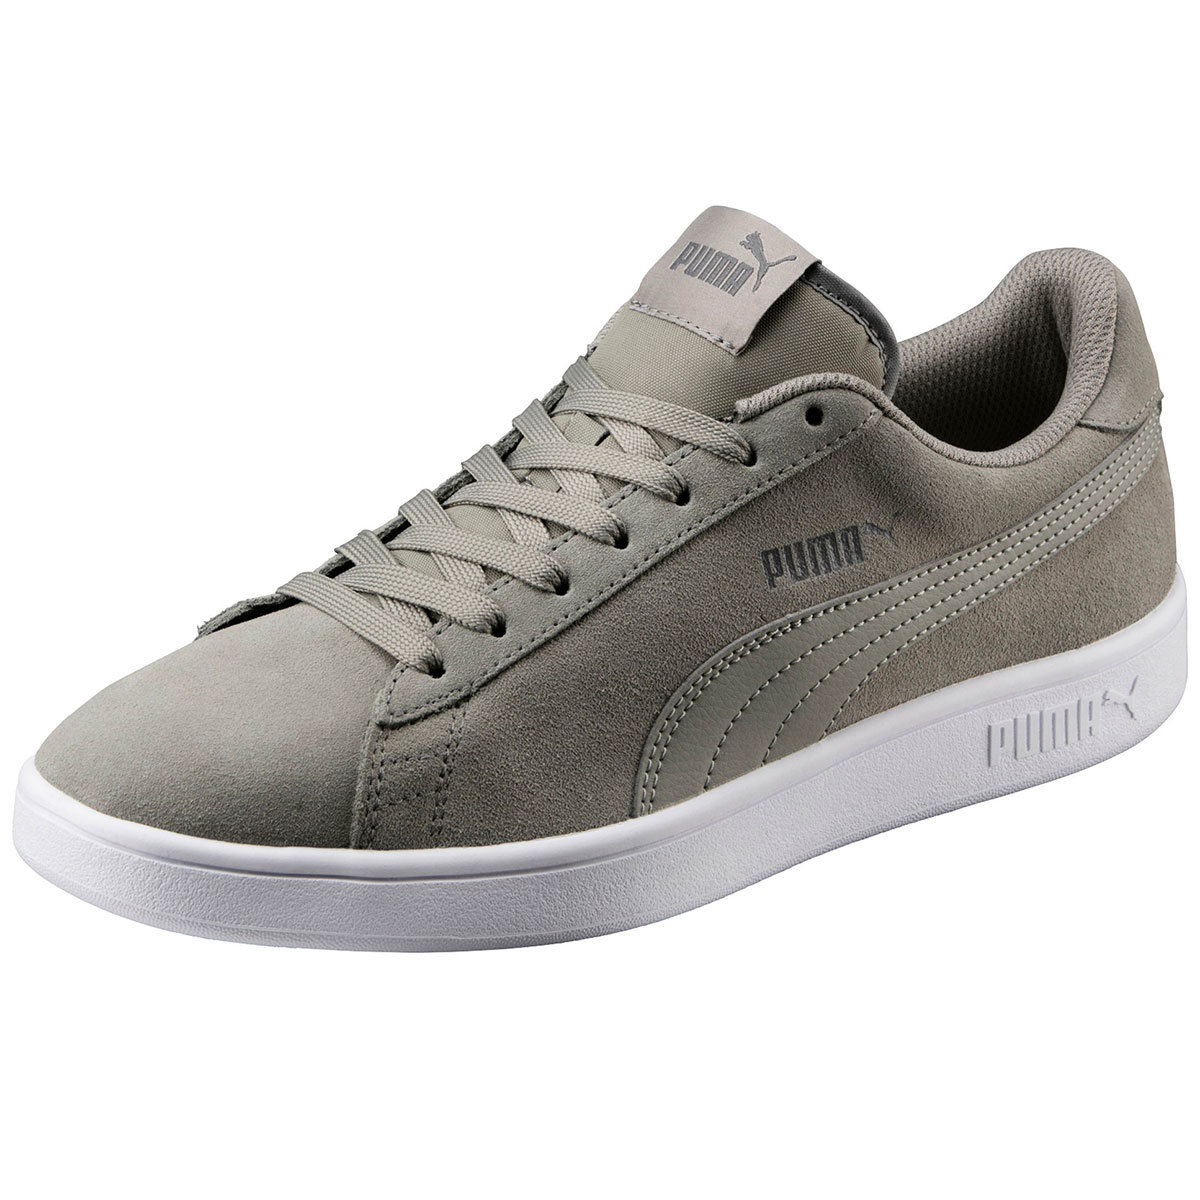 Puma Men's Smash V2 Sneakers - Black, 10